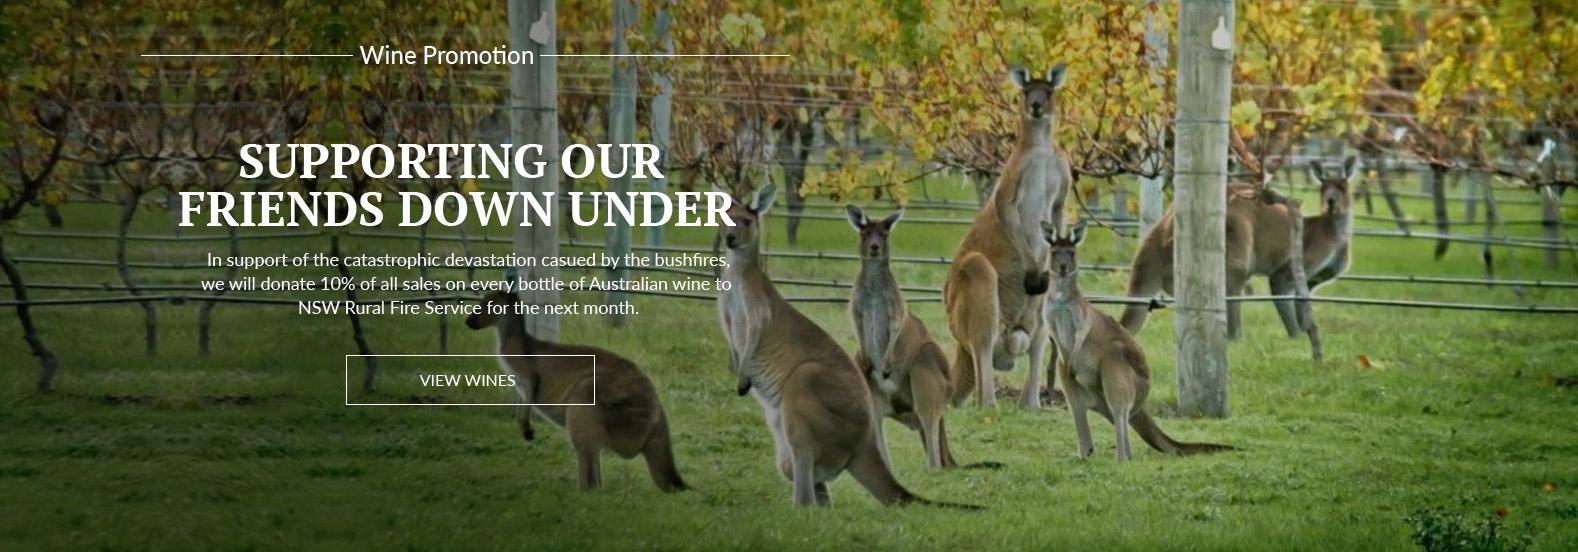 Kangaroos in wineyard